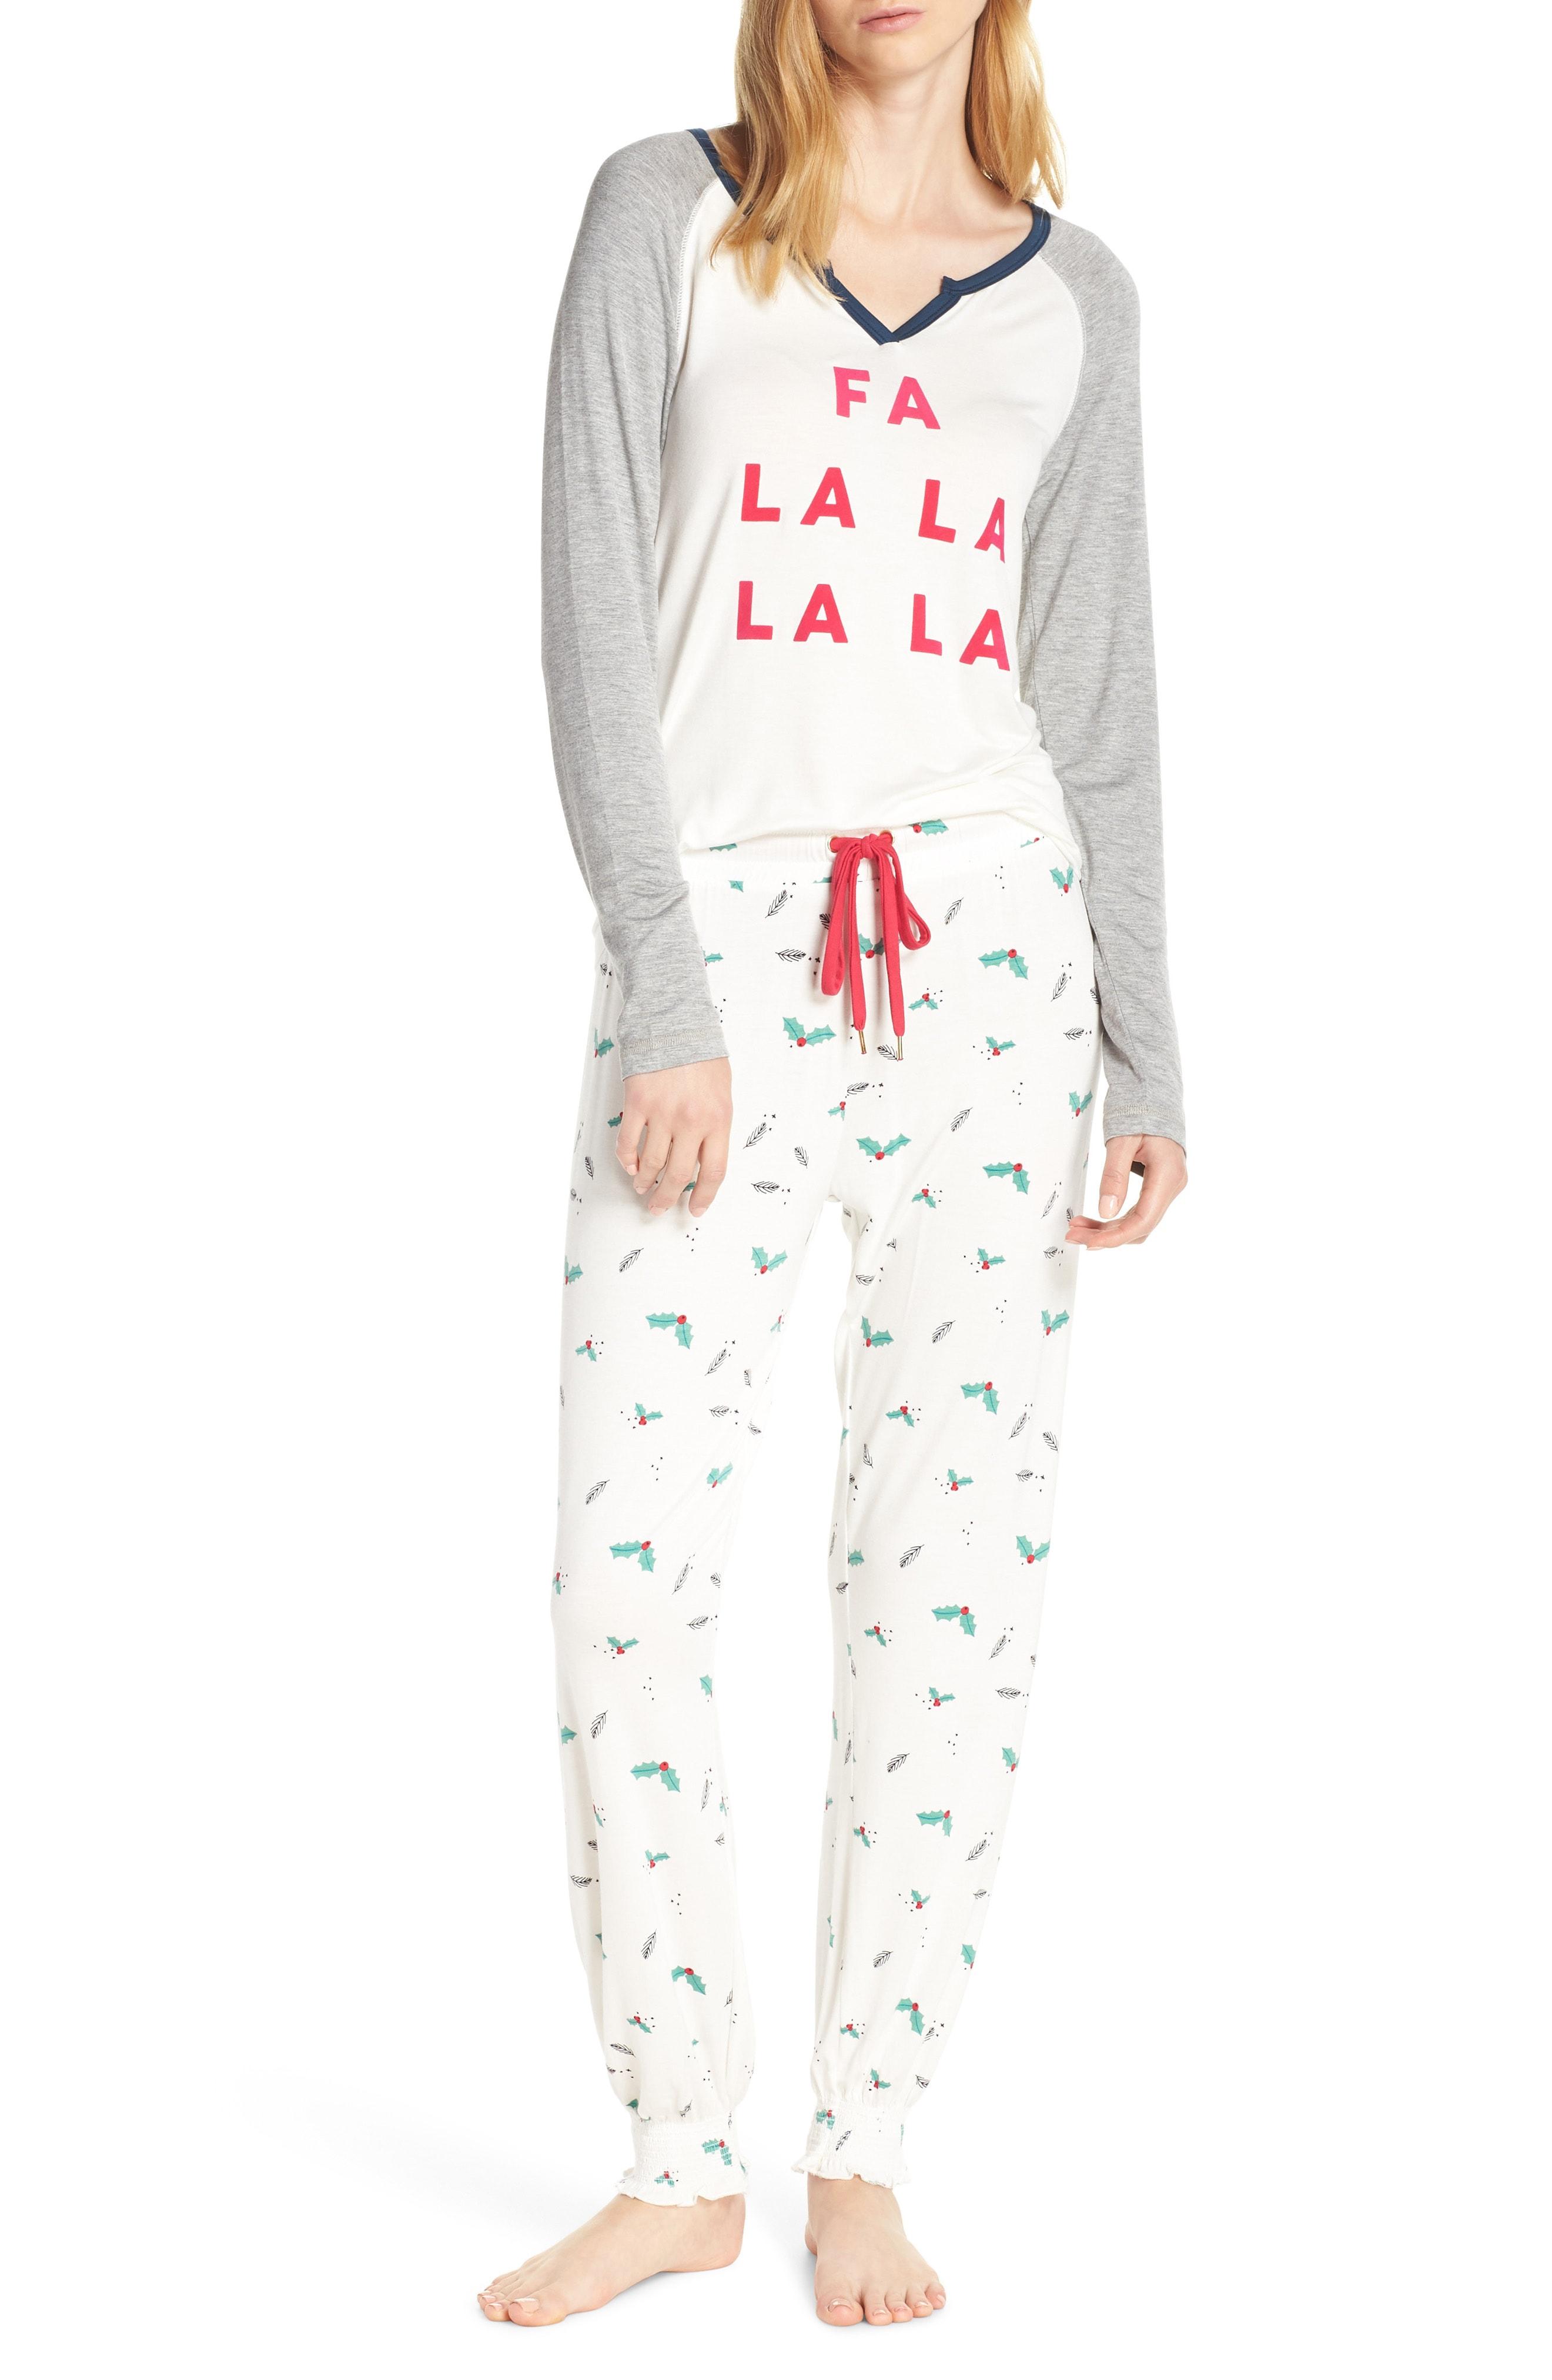 Honeydew Intimates Winter Breaker Pajamas